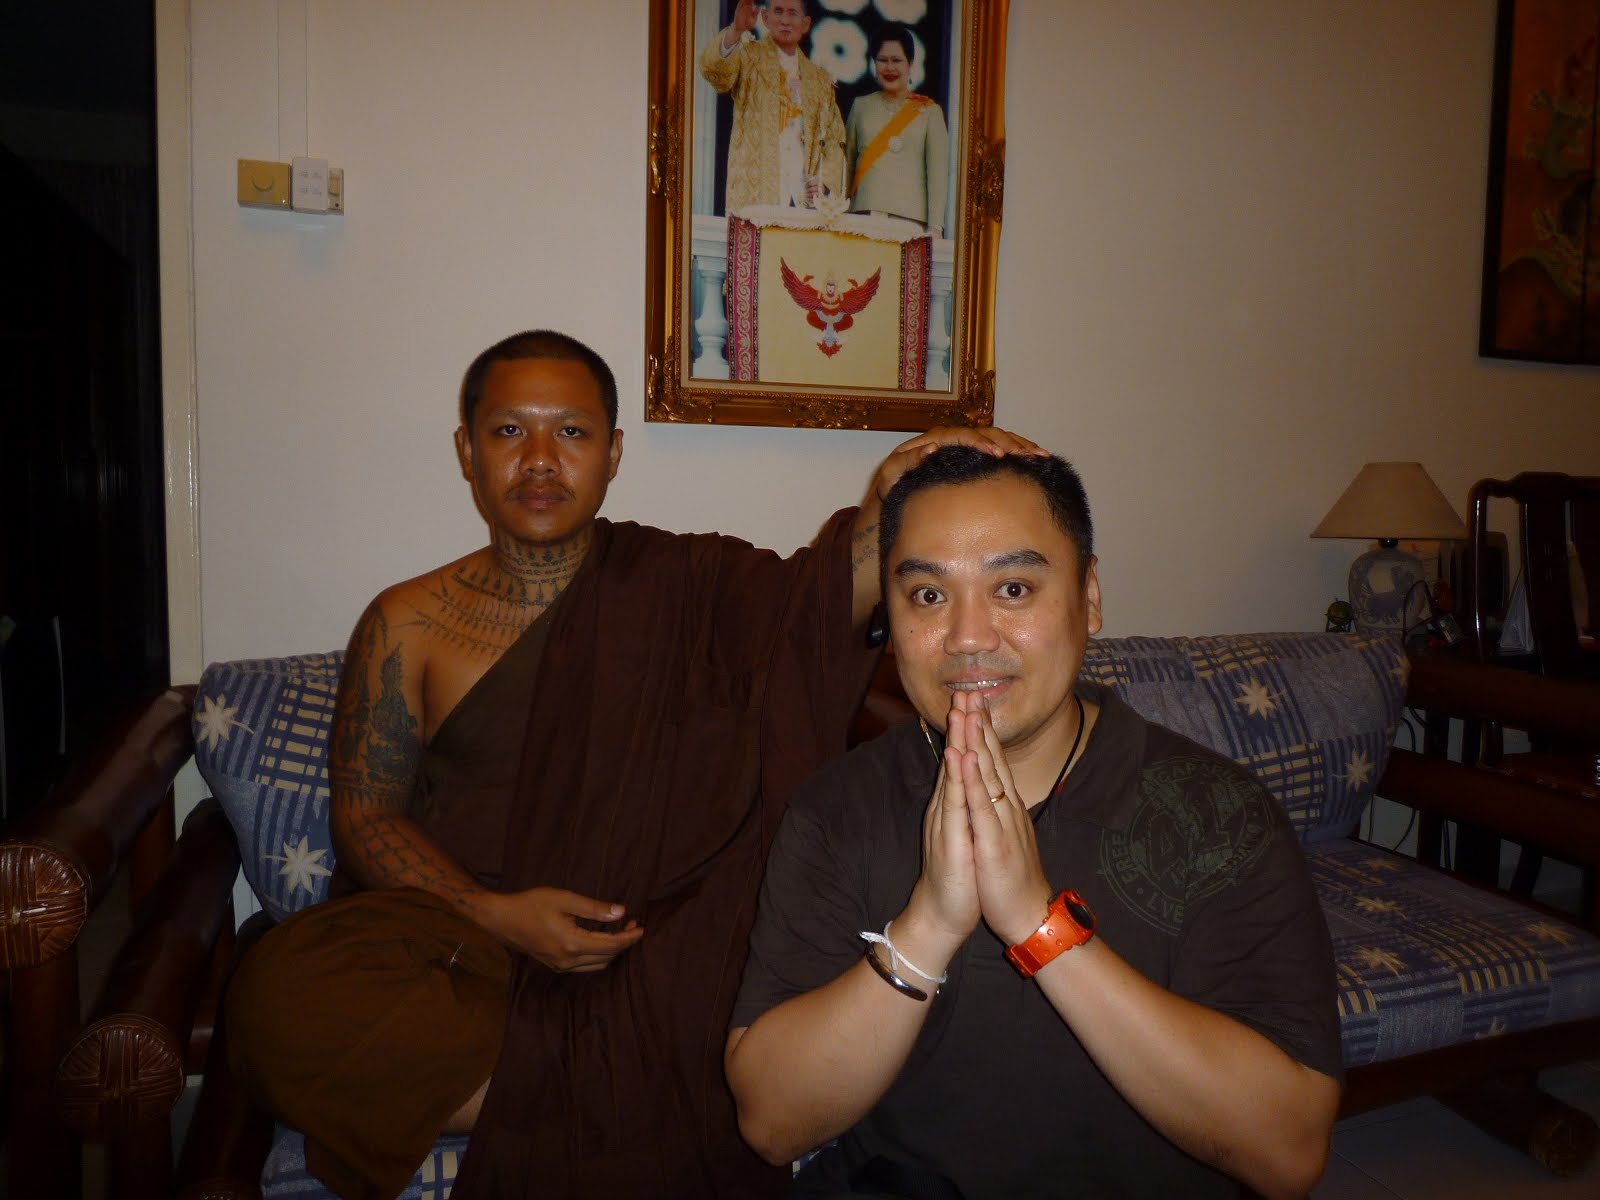 Kruba Thammunee Wat Suanpar